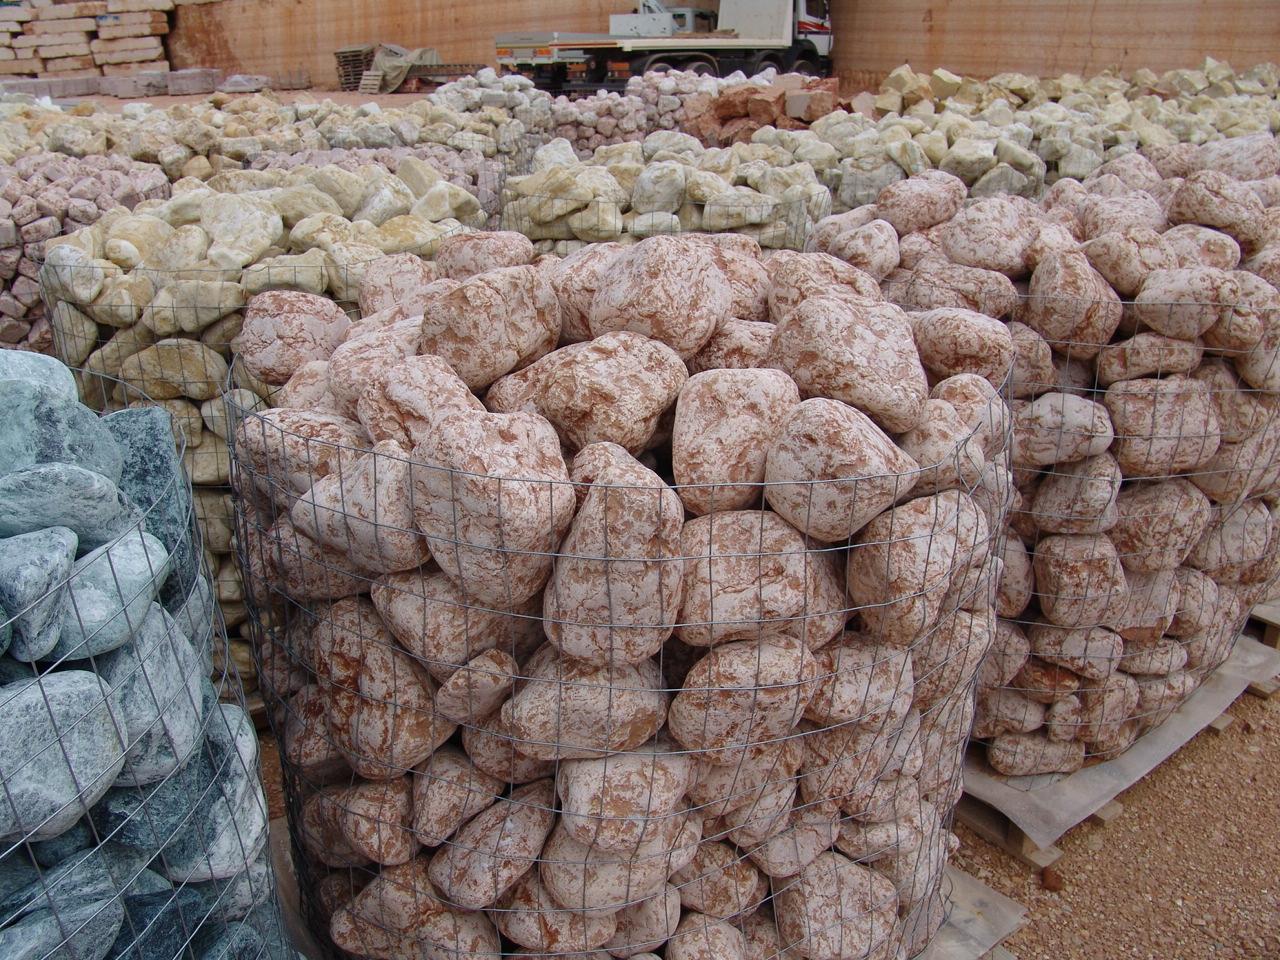 Vendita Pietre Da Giardino : Pietre da giardino vendita on line: foto di pietre per muri sassi